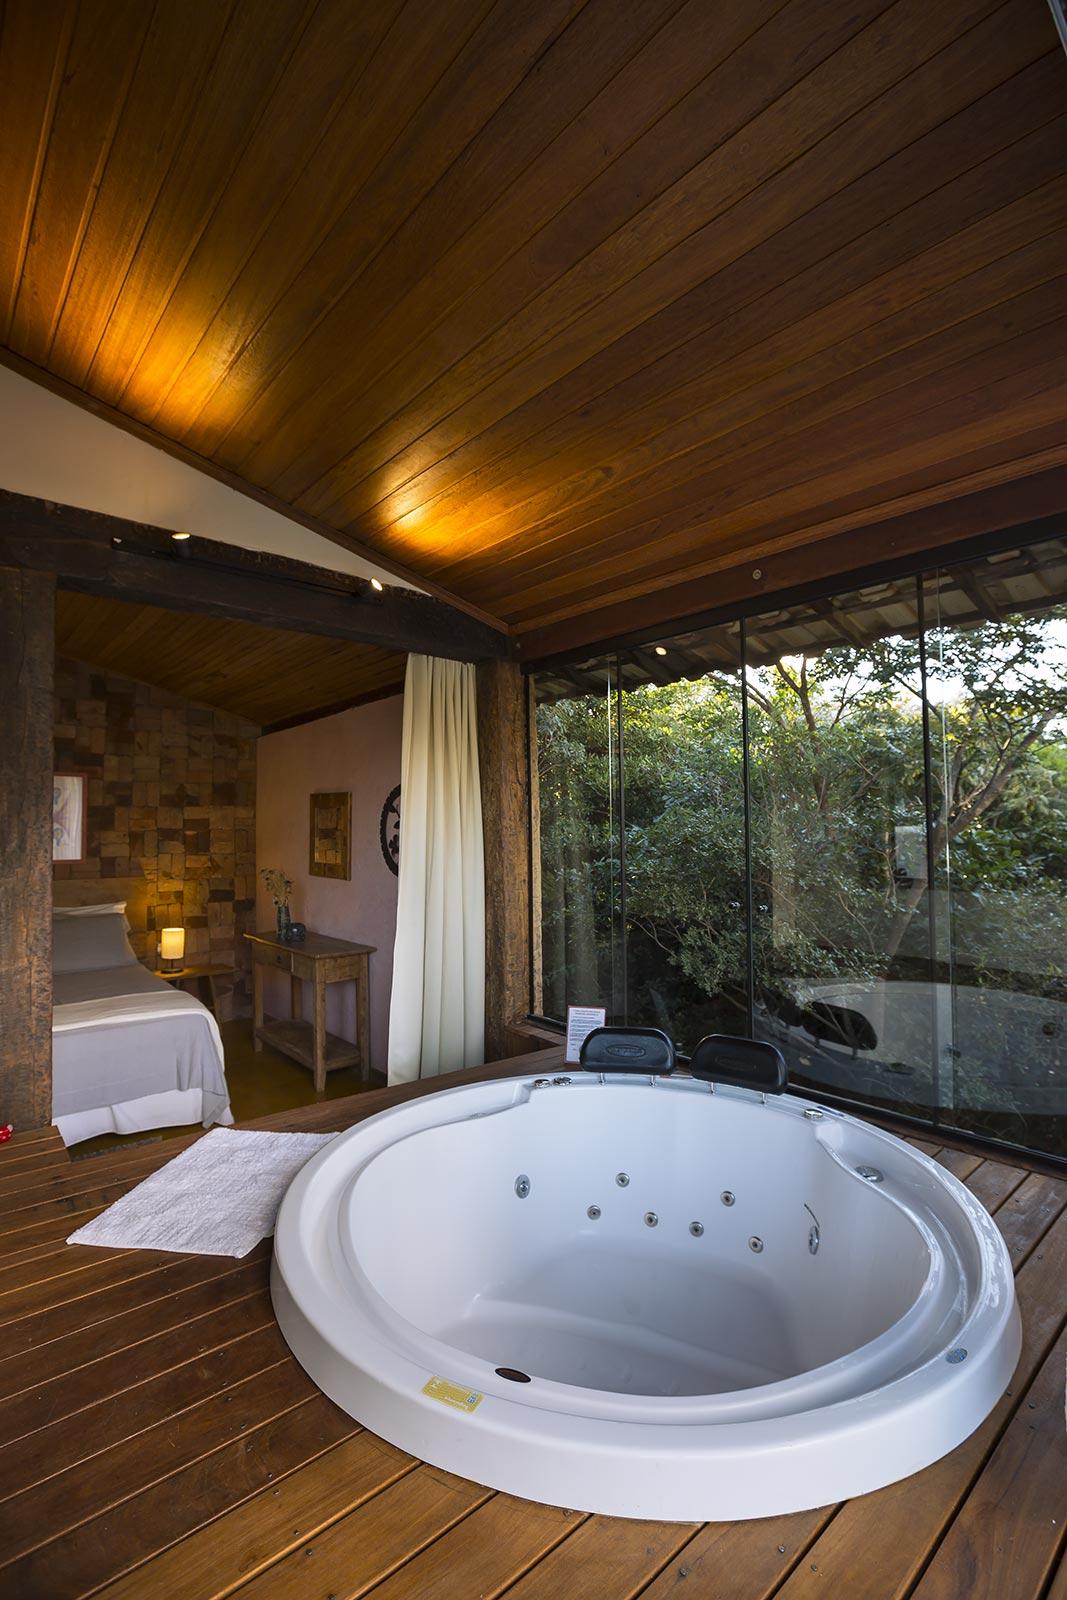 Casa do Teuler - Da Mata - Hidro - Lapinha Da Serra MG - Pousada Hotel